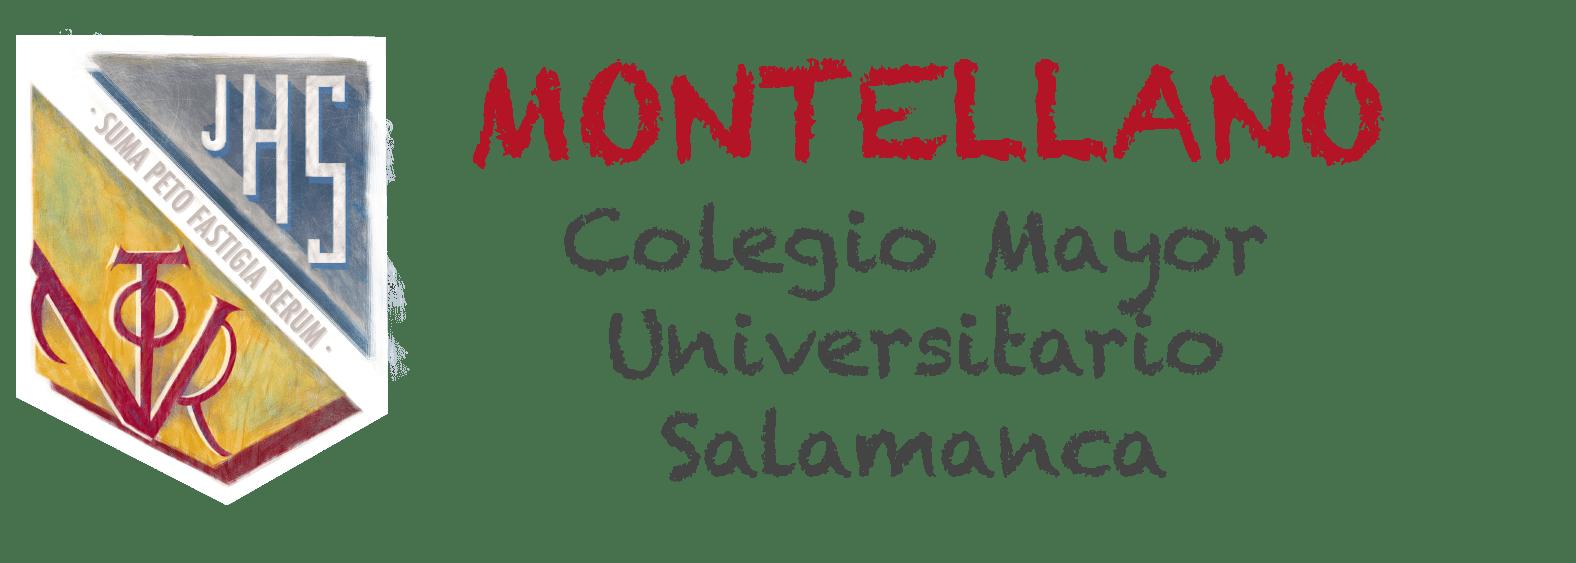 Colegio Mayor Montellano